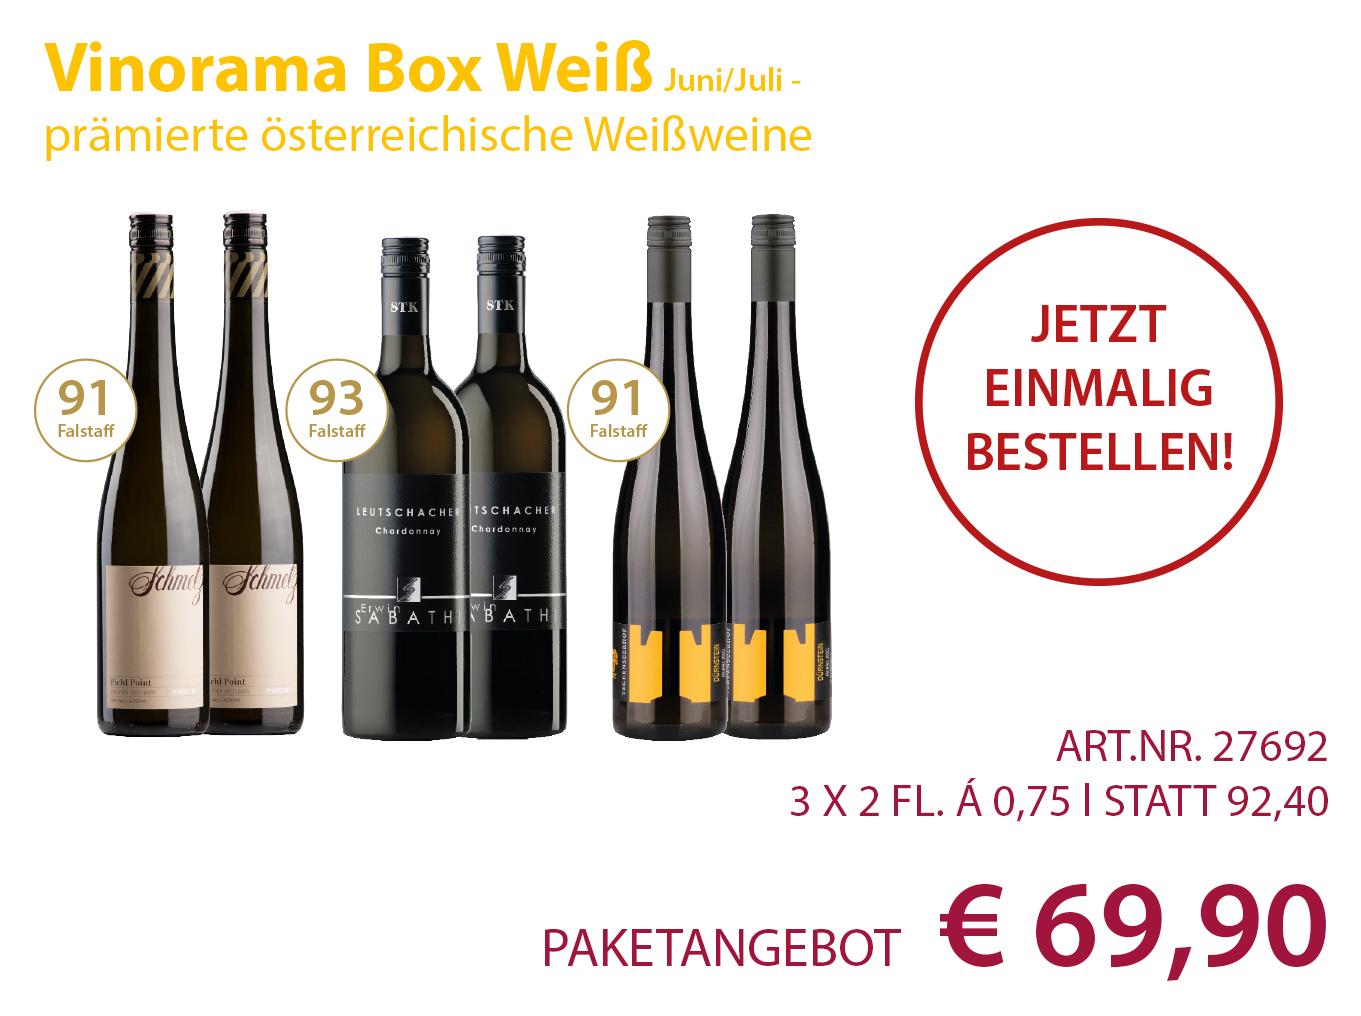 Vinorama Box Weiss Paket